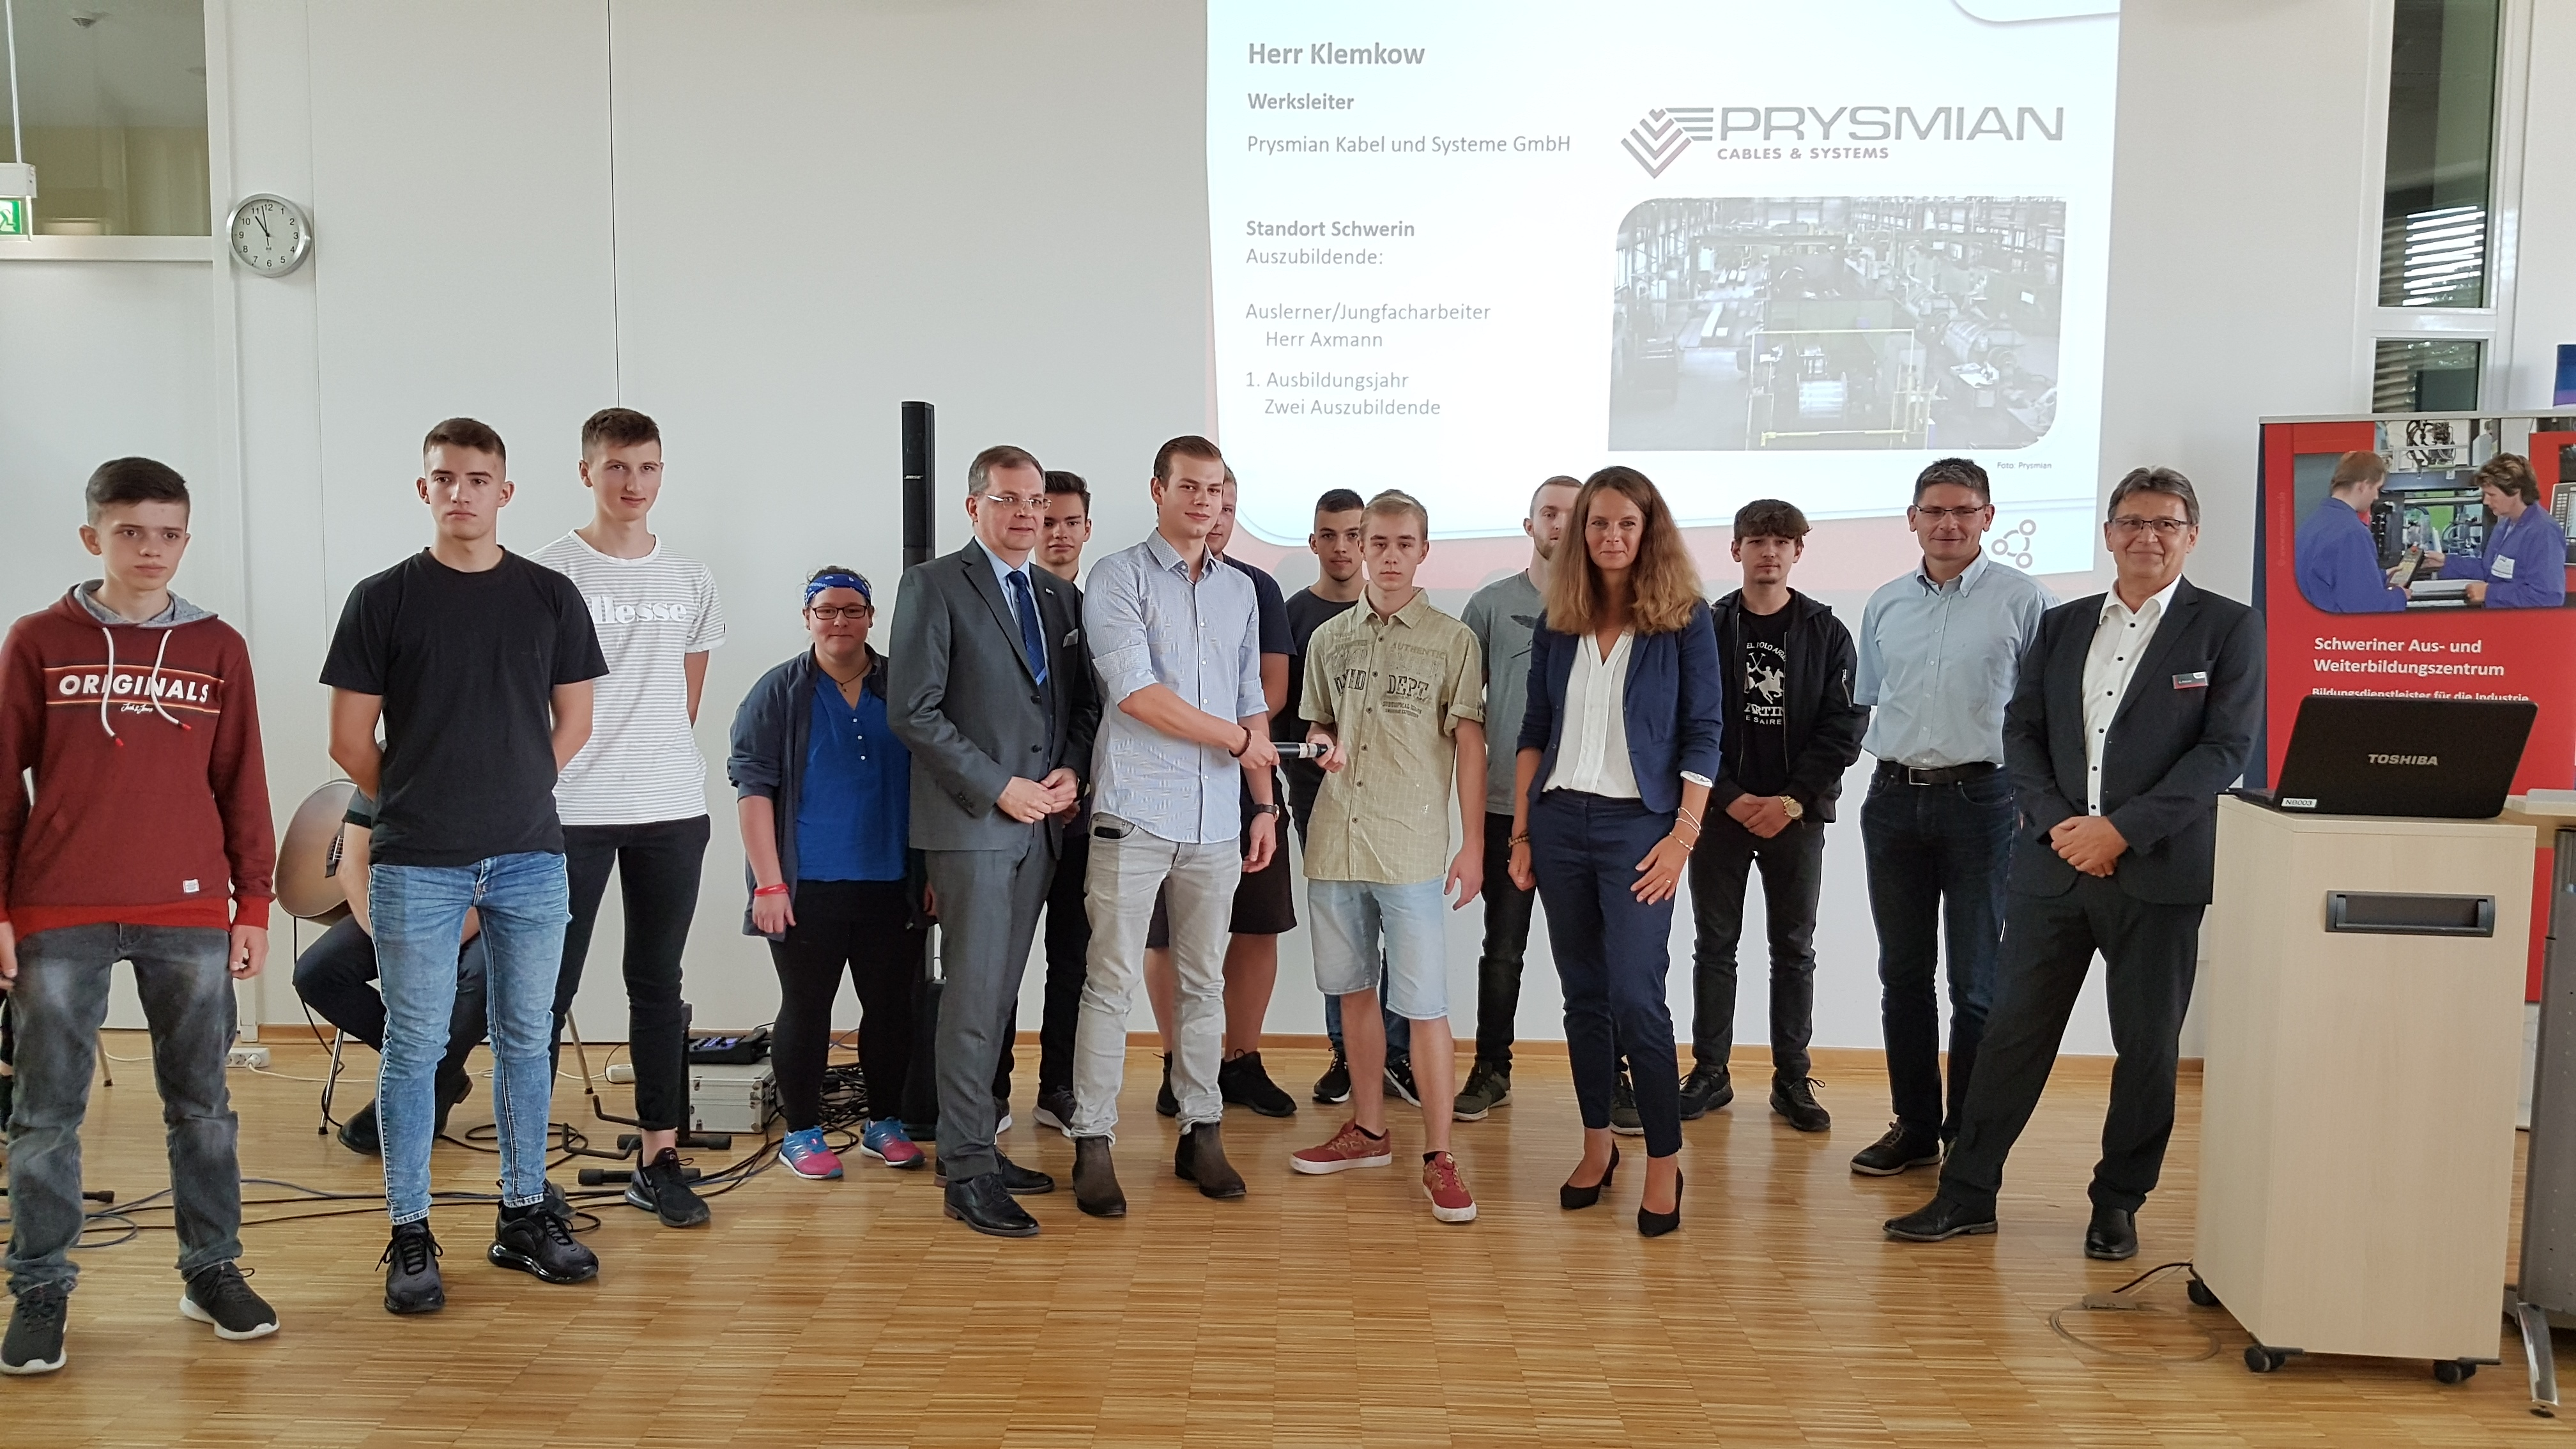 2019-09-02_Lehrjahreseröffnung-2019_Staffelstabübergabe-Prysmian